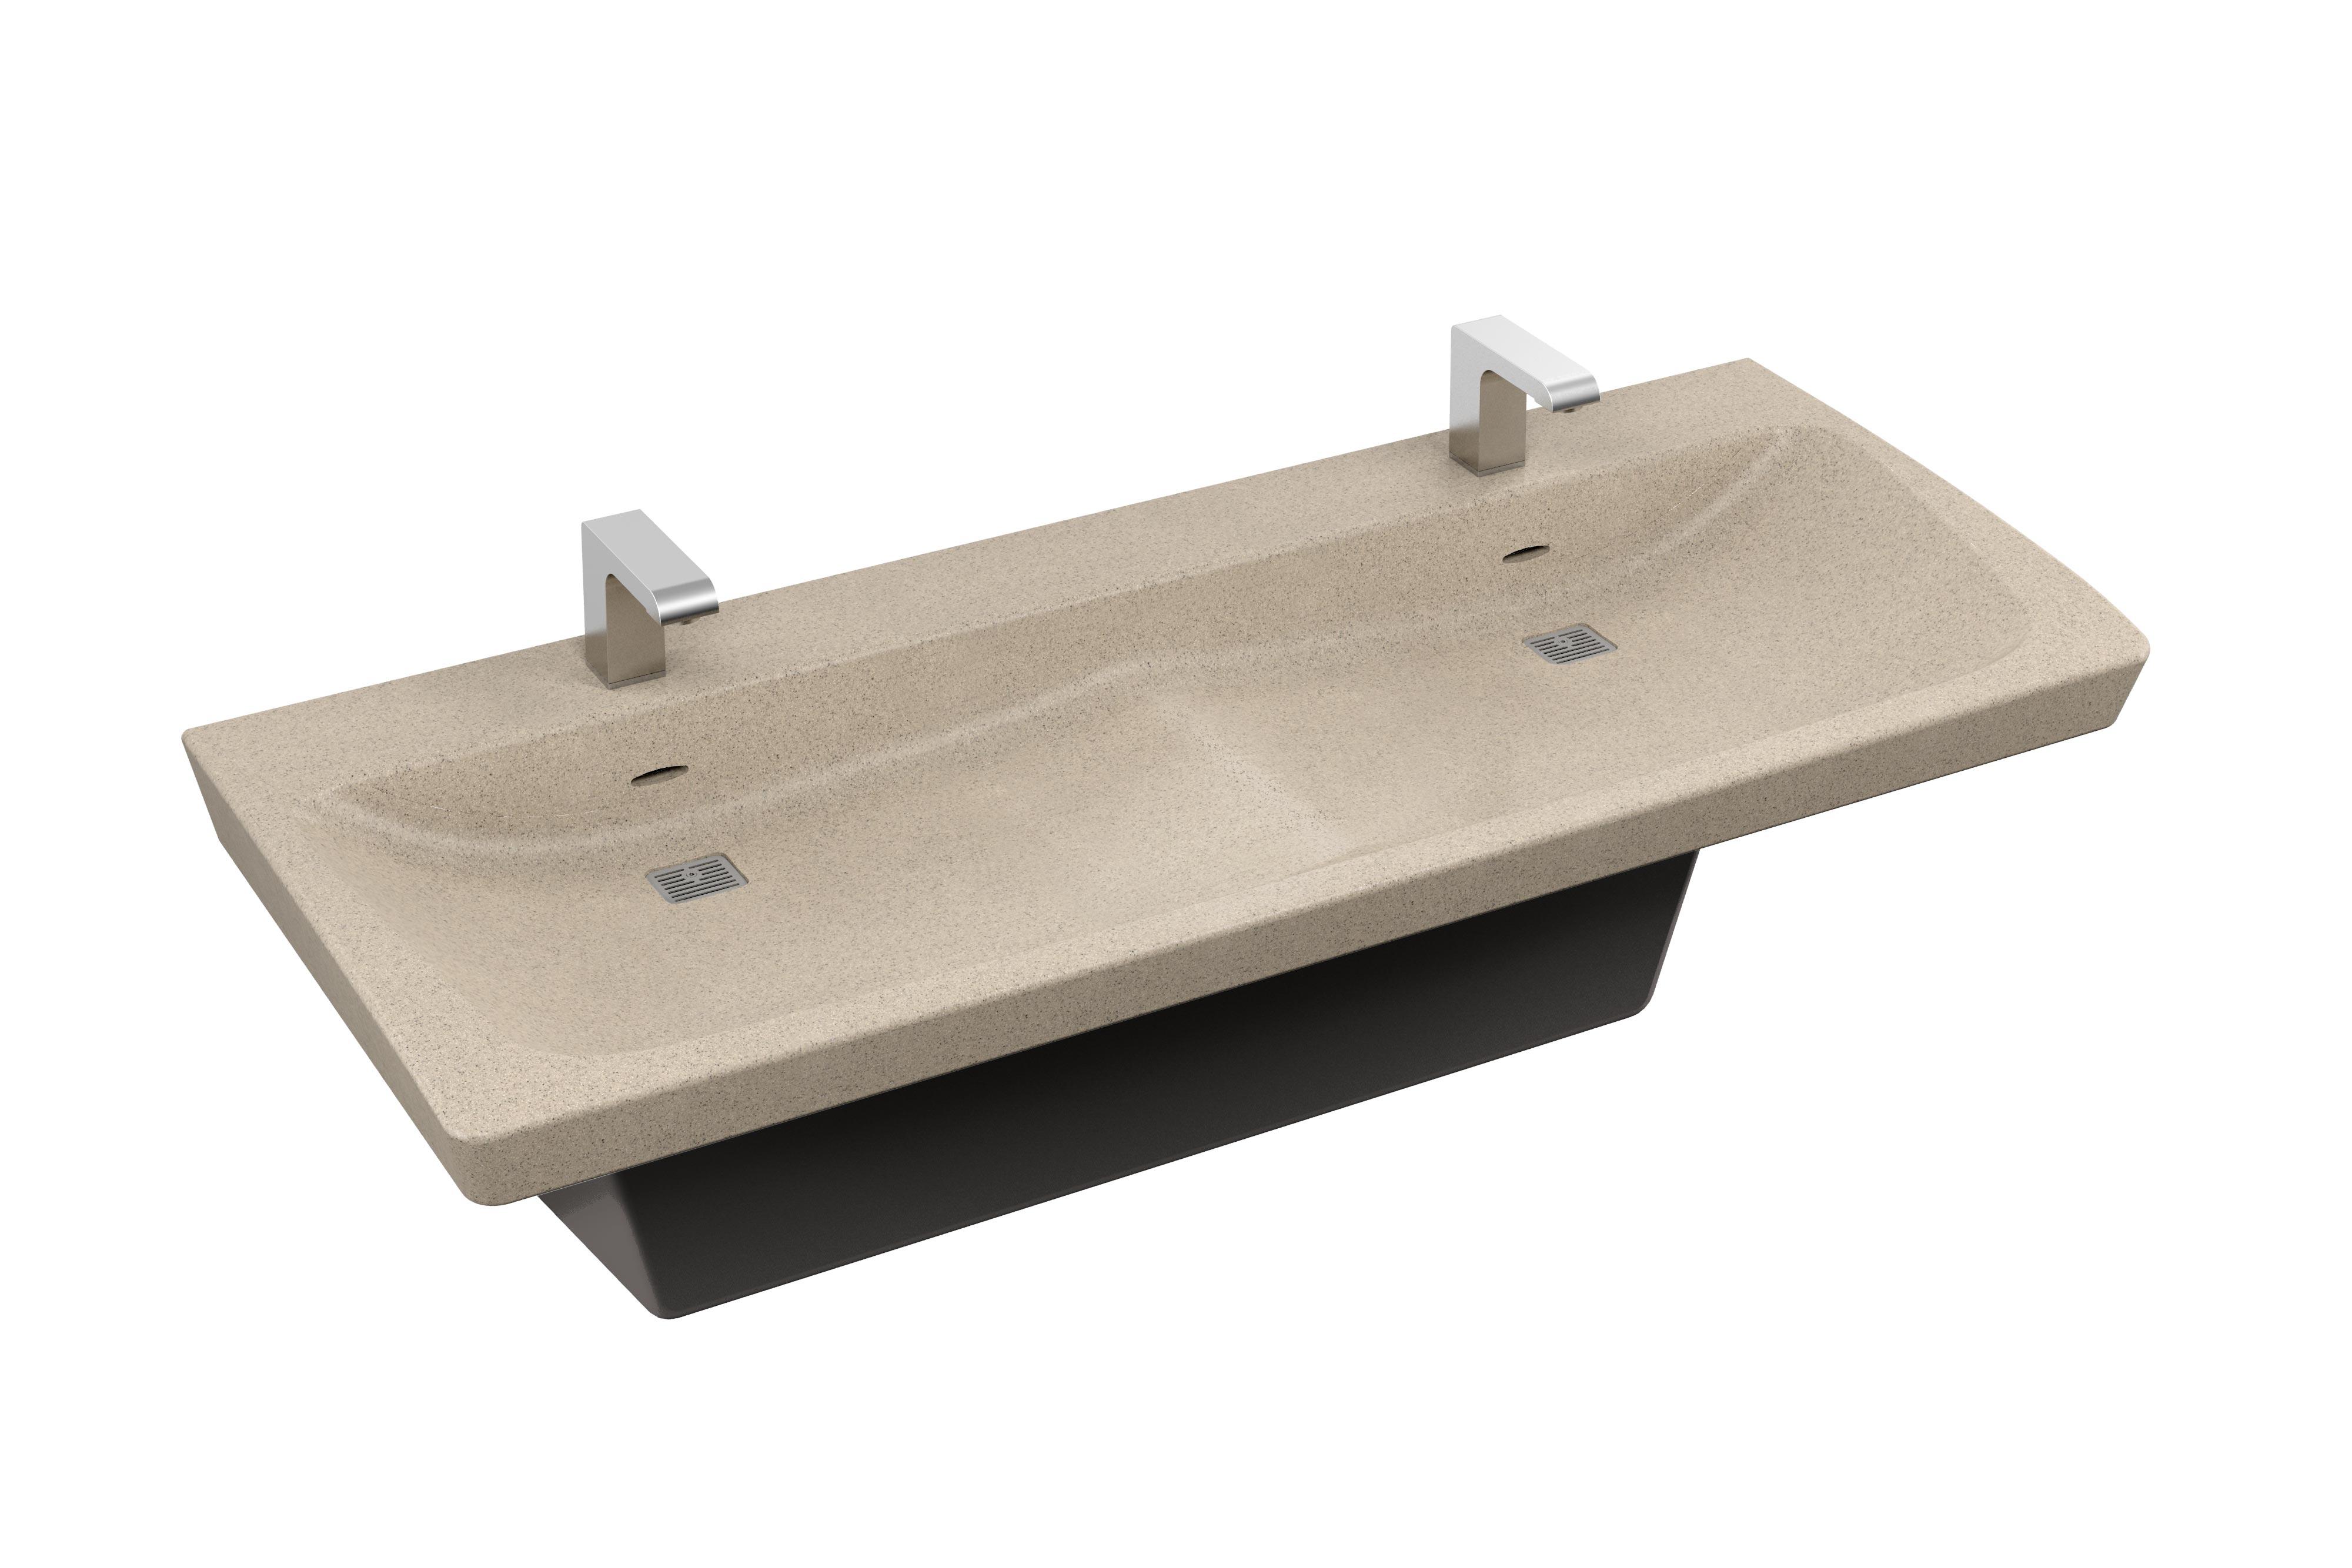 bradley bathroom. TerreonRE Recycled Solid Surface Material Bradley Bathroom A